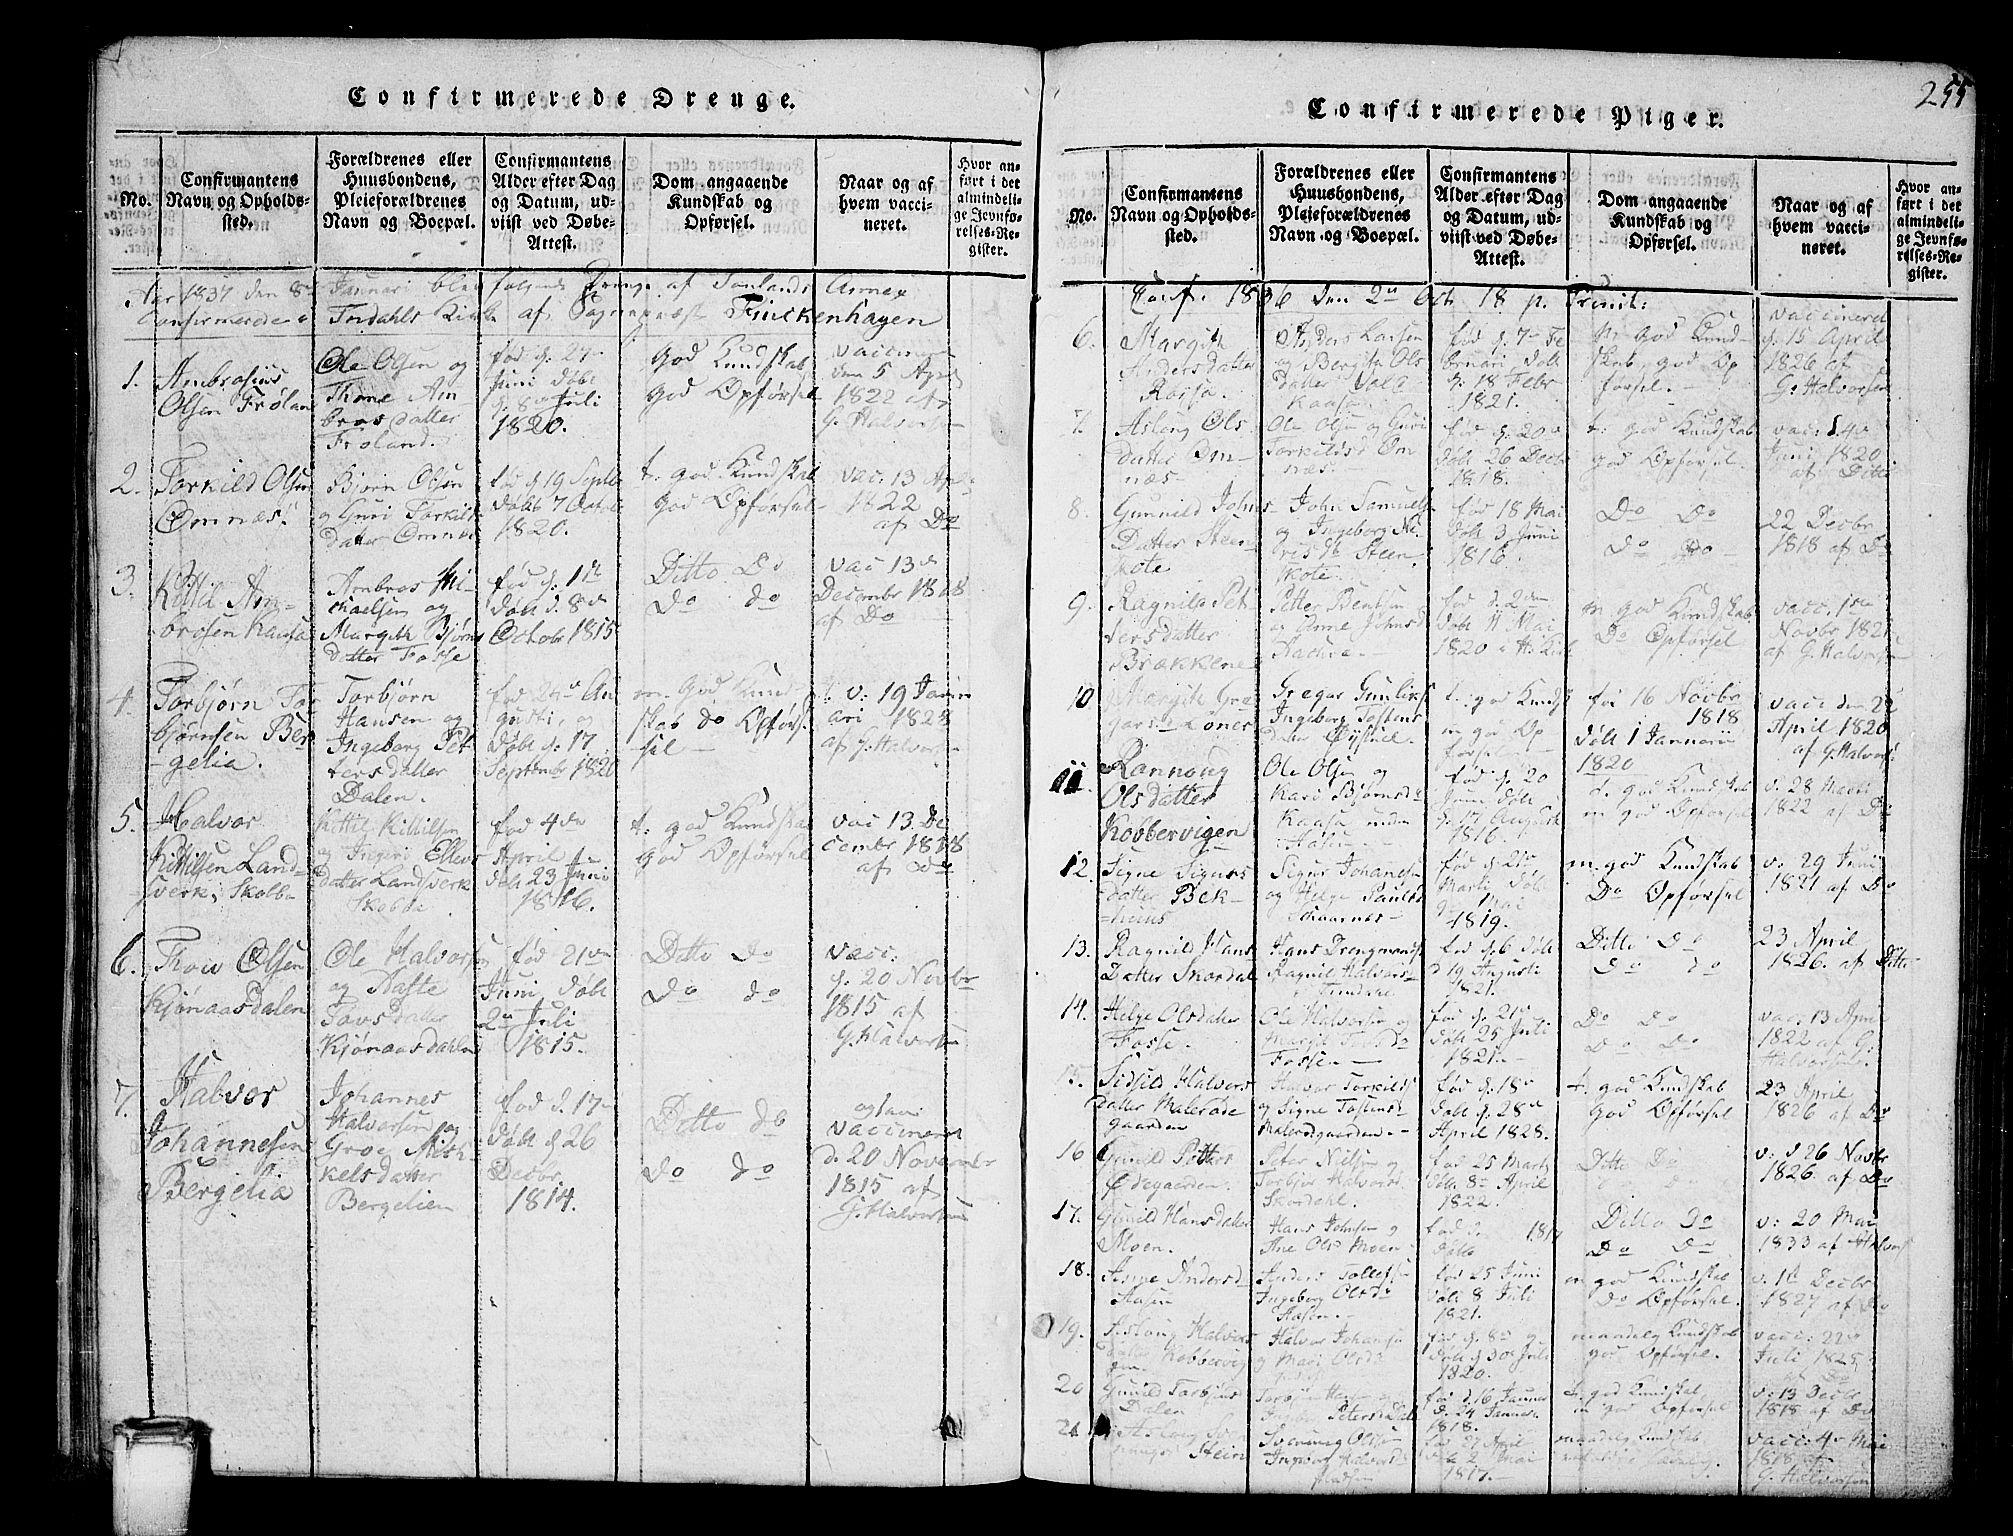 SAKO, Hjartdal kirkebøker, G/Gb/L0001: Klokkerbok nr. II 1, 1815-1842, s. 255